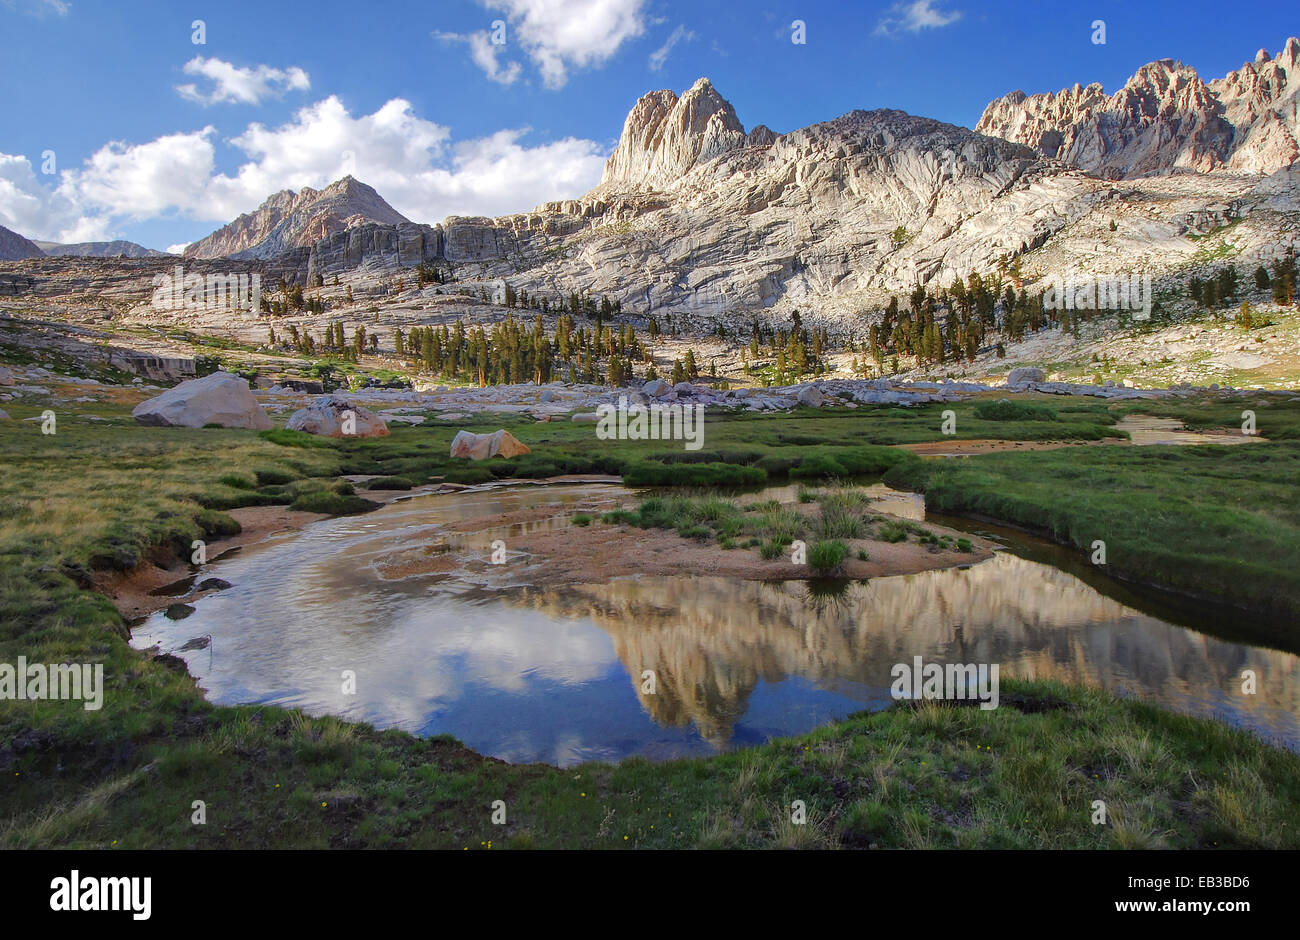 USA, California, Reflections in Miter Basin Stock Photo